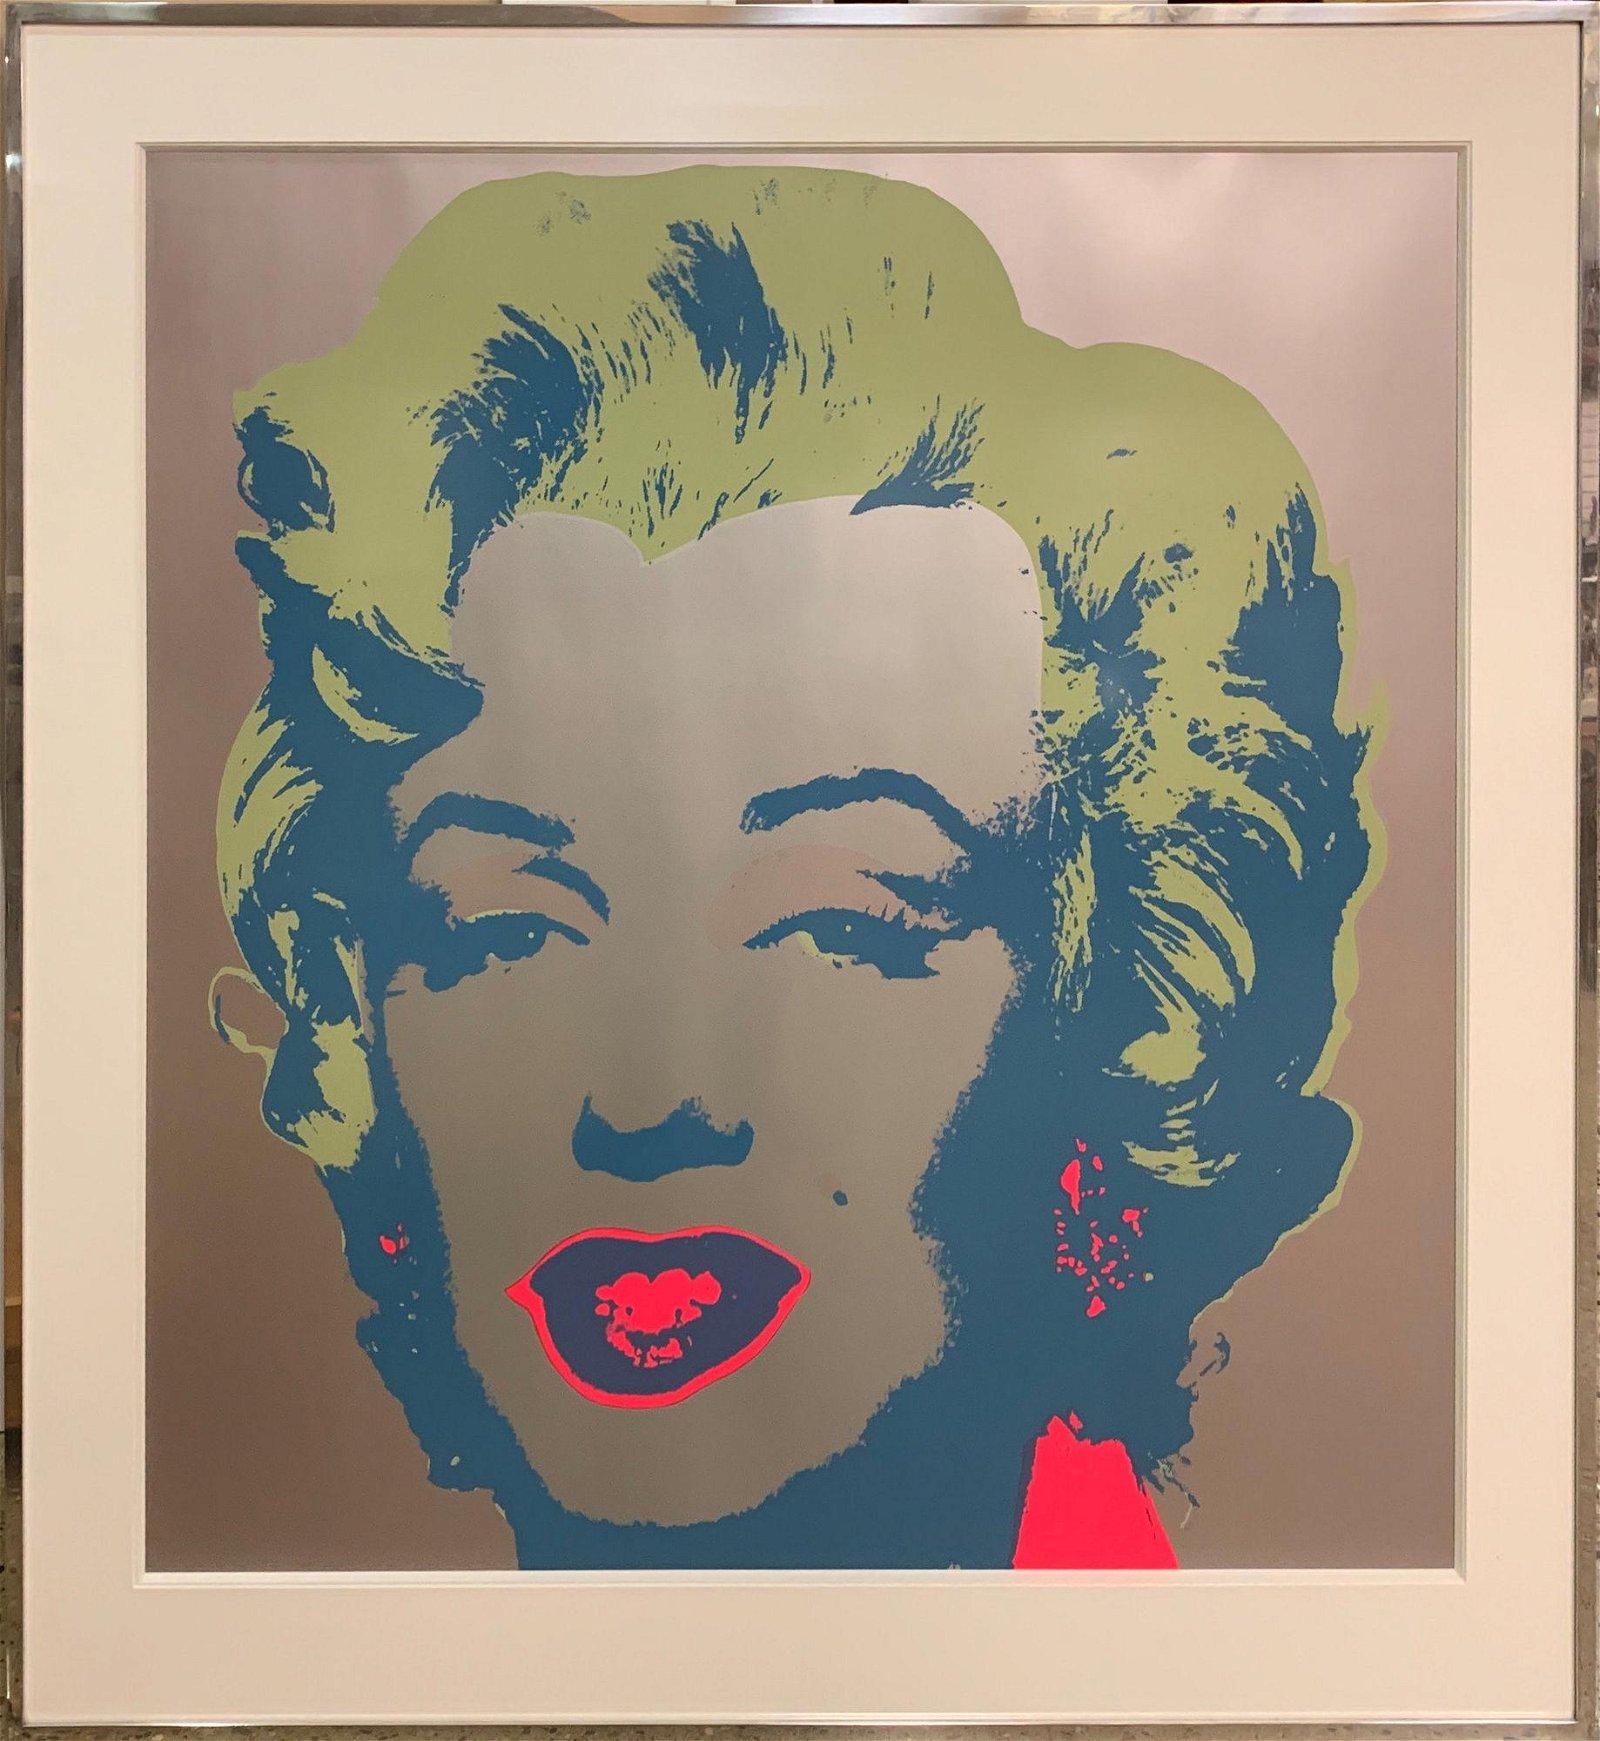 MARILYN MONROE POP ART ANDY WARHOL PRINT IN CHROME